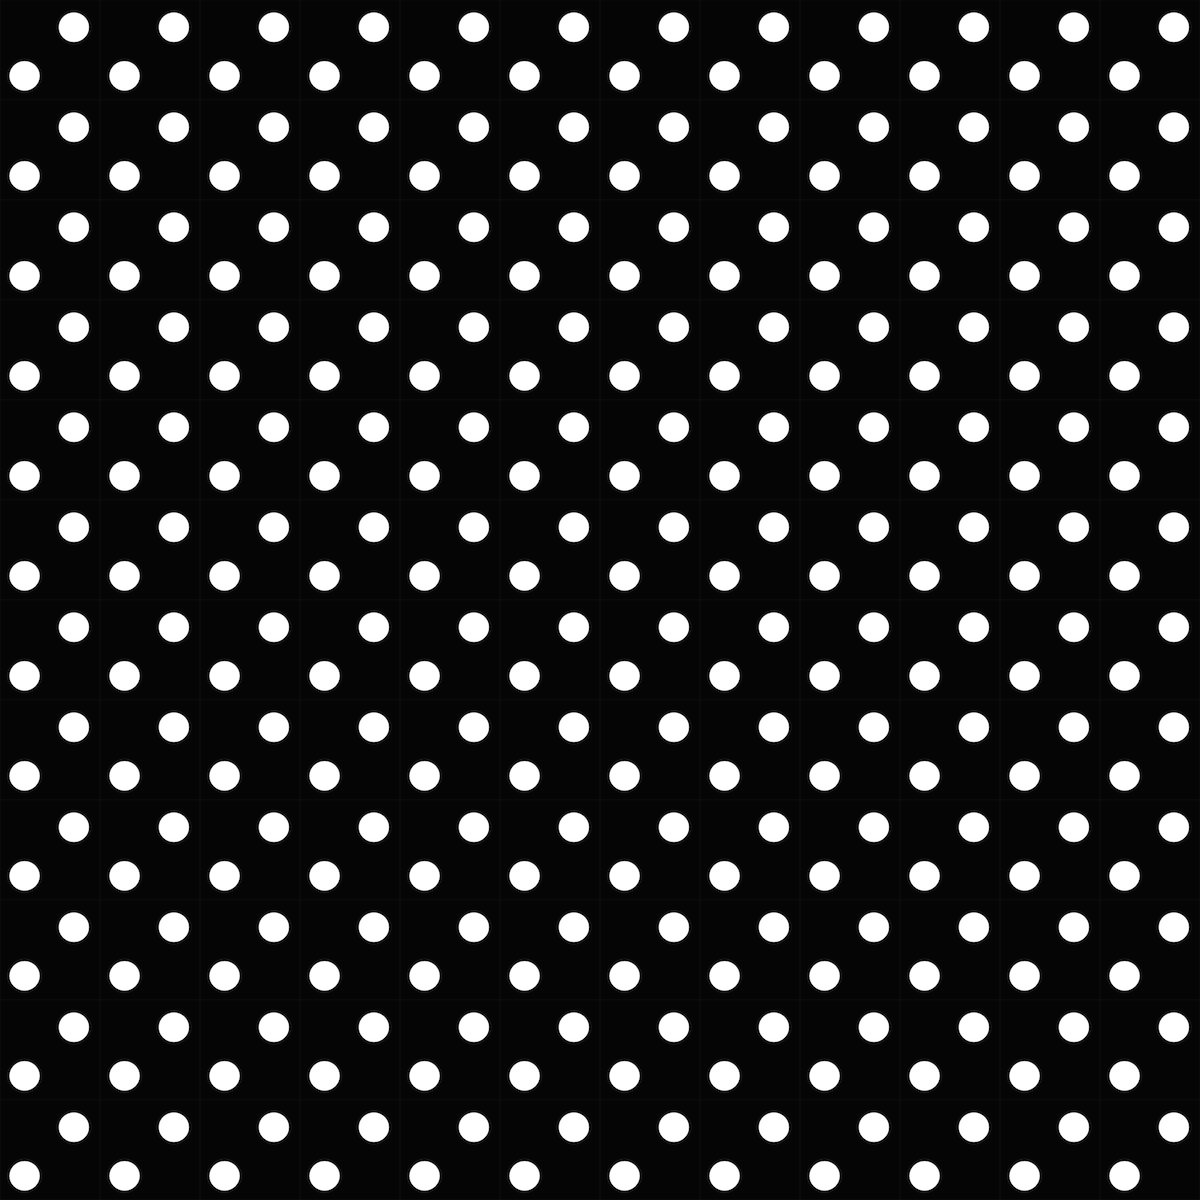 free digital black and white scrapbooking paper   ausdruckbares 1200x1200